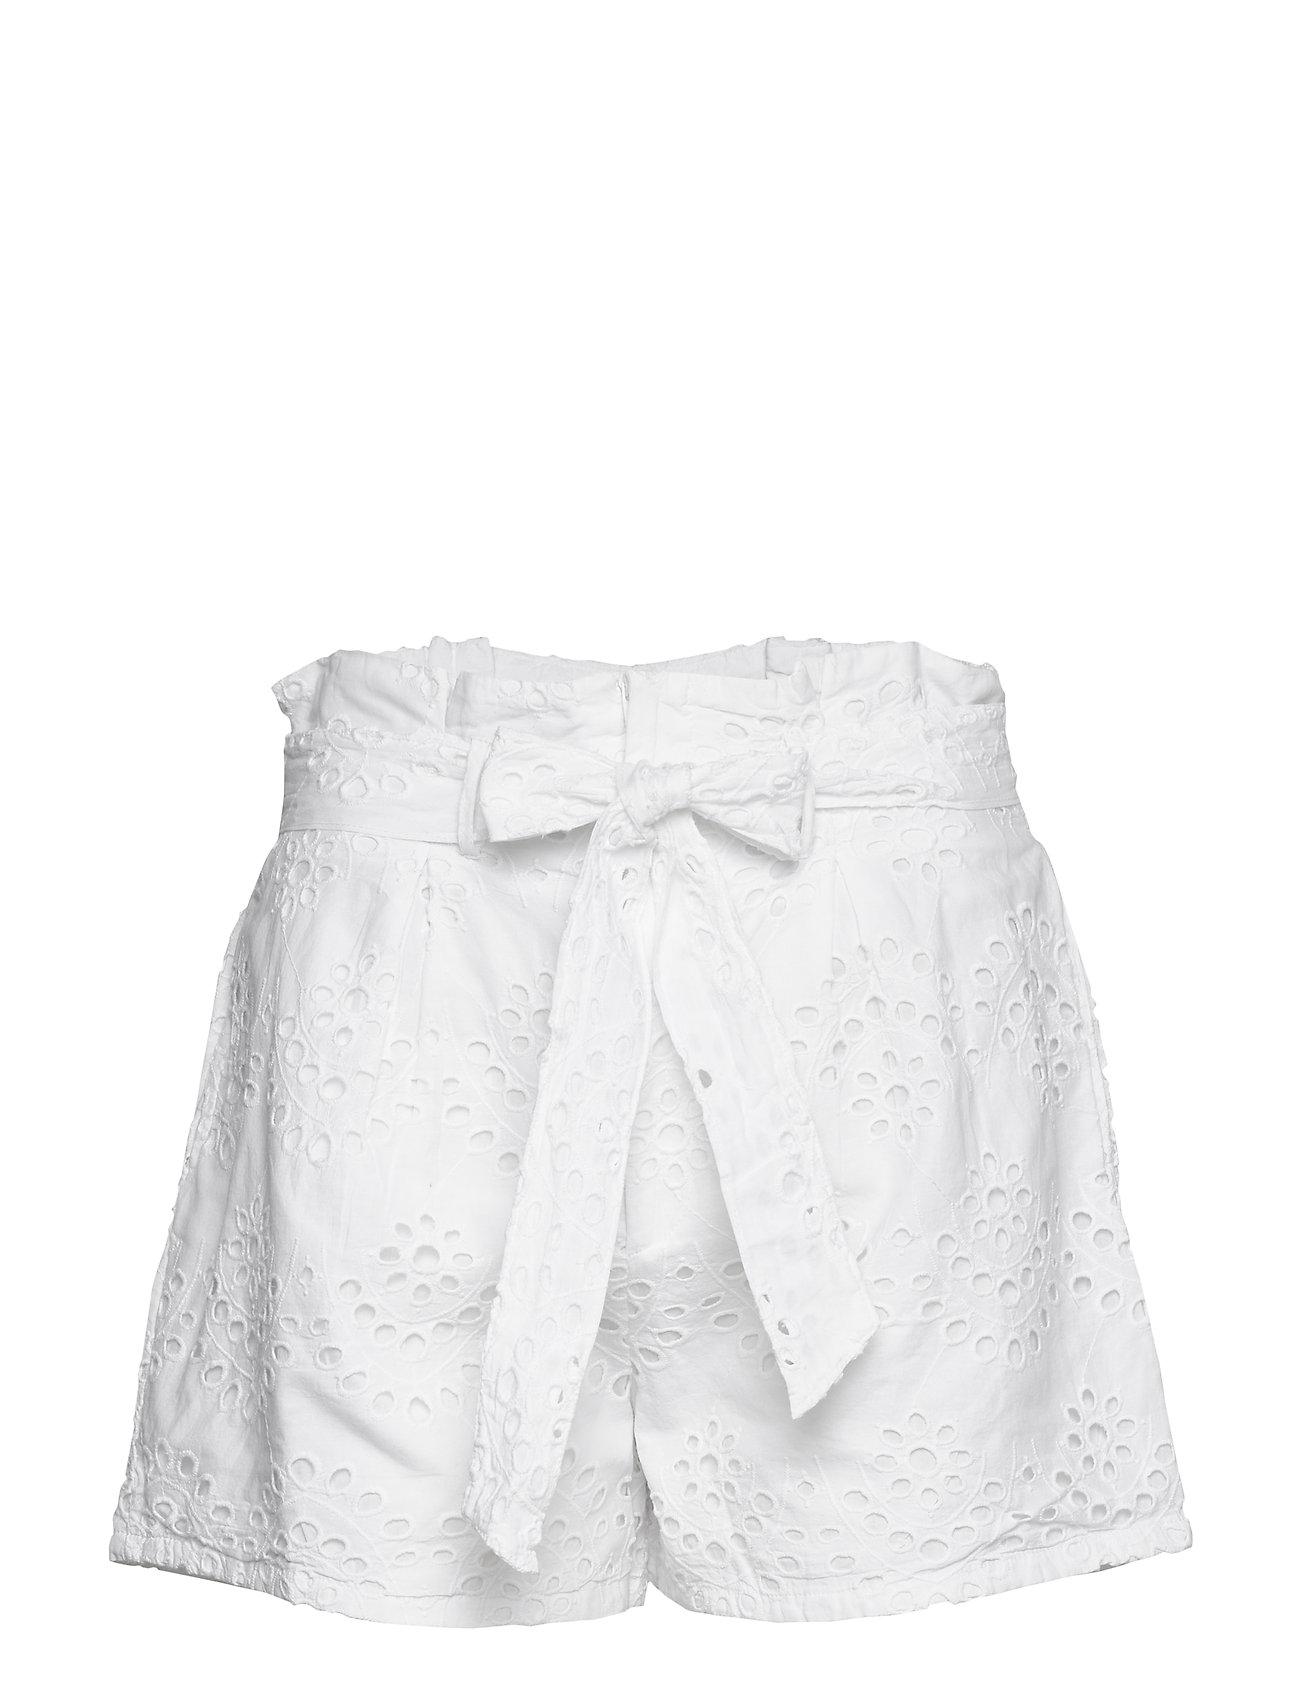 Image of Paper Bag Mini Shorts Shorts Flowy Shorts/Casual Shorts Hvid Ivyrevel (3406317527)